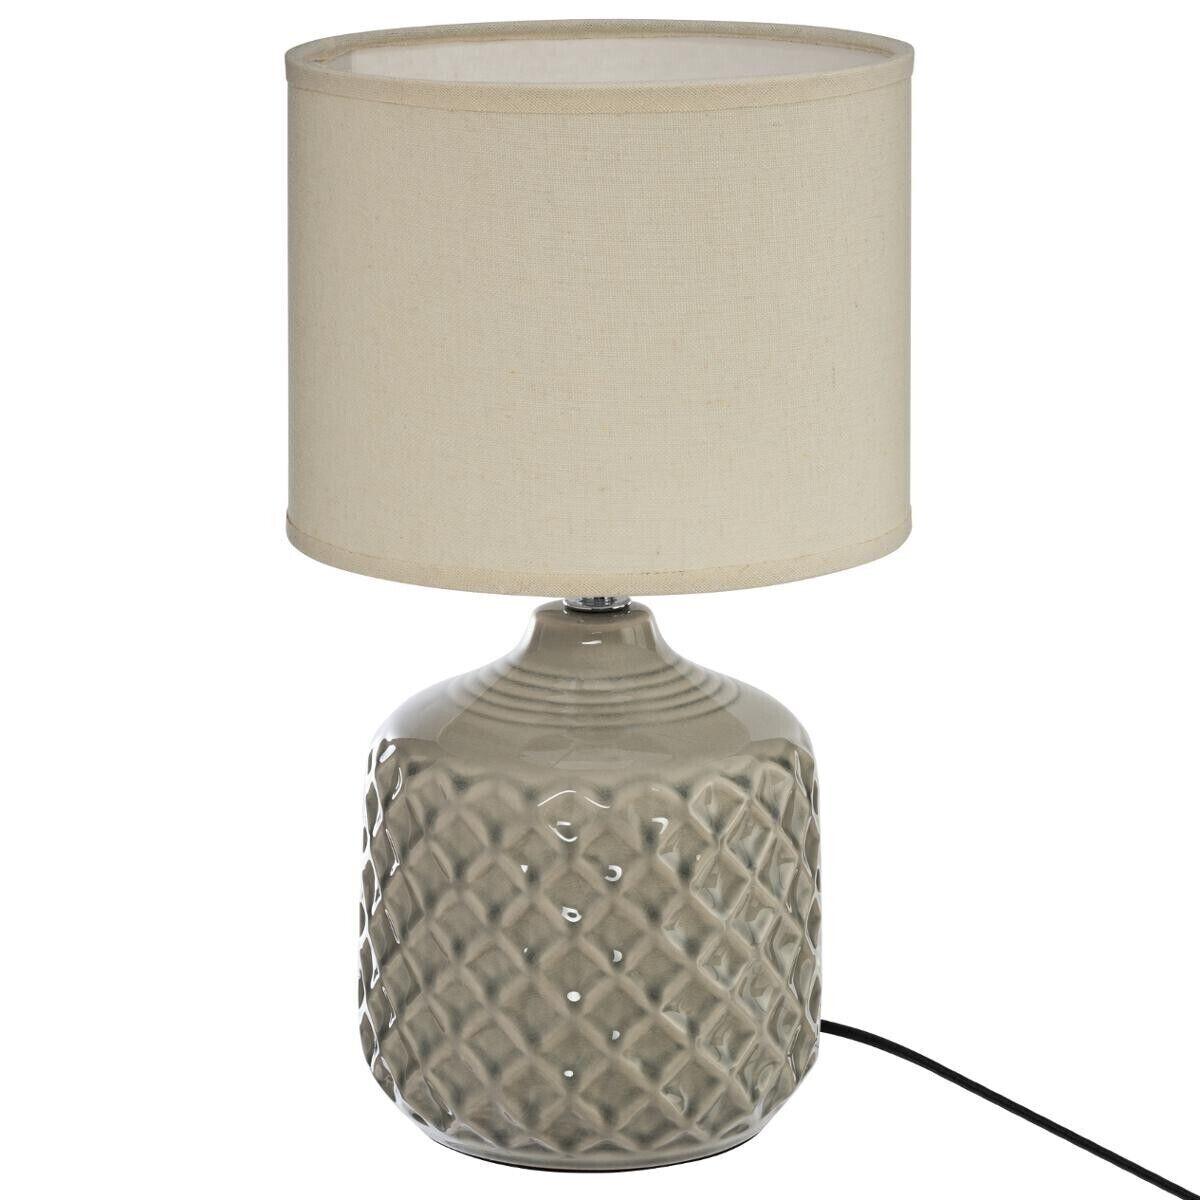 Atmosphera Lampe 'Ilou', taupe et blanc, céramique H37 cm